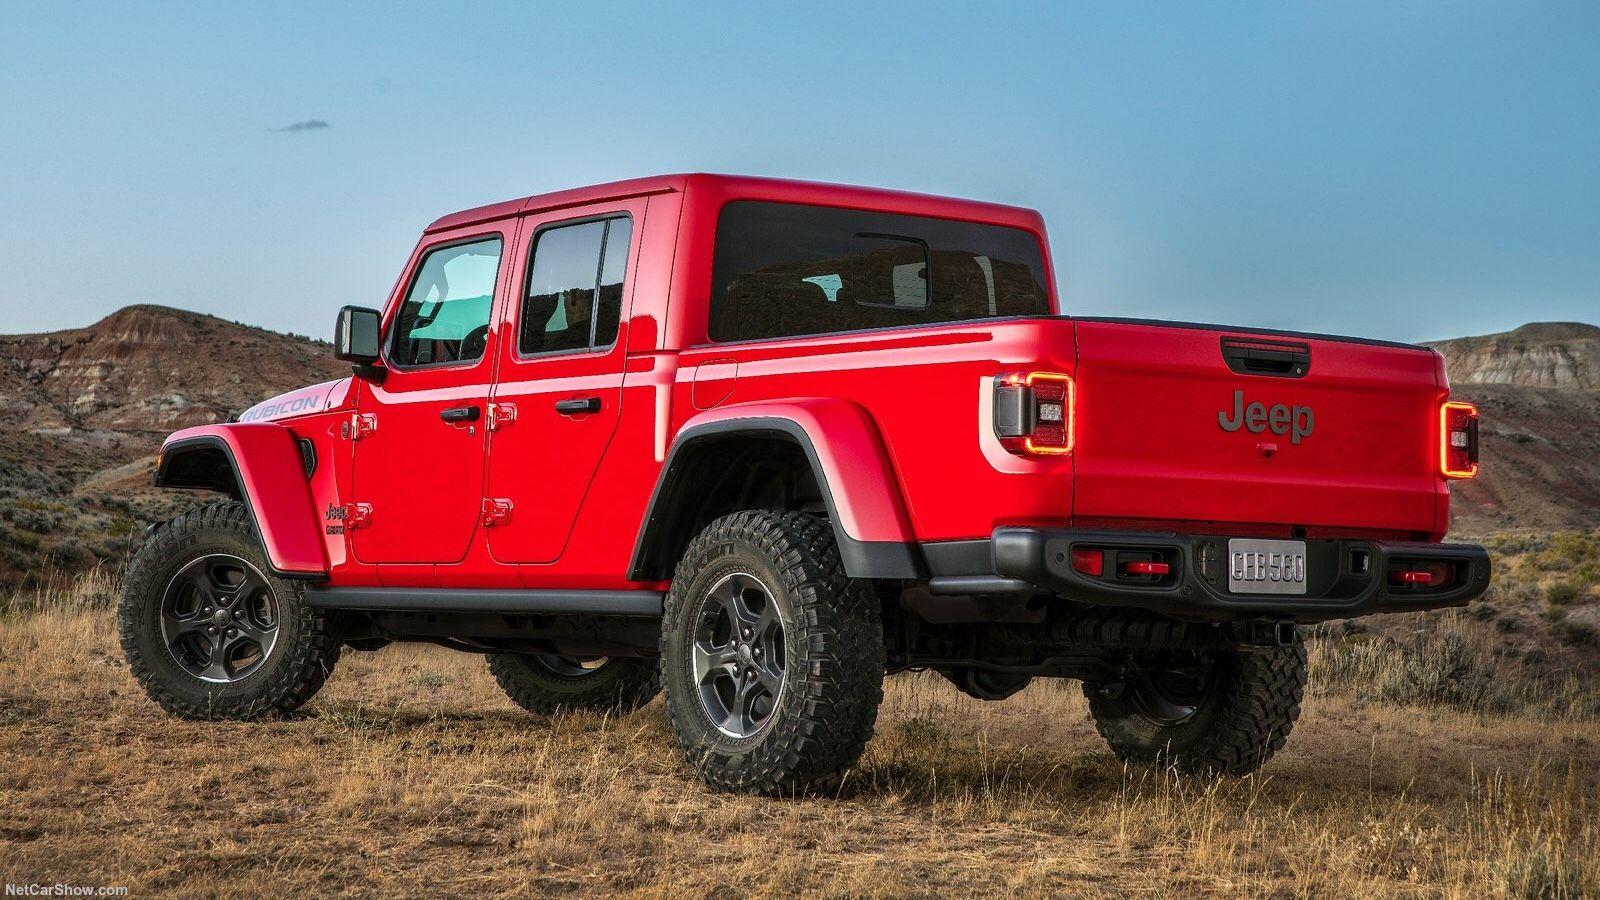 Pin by Alexa R on Top down Jeep gladiator, Pickup trucks